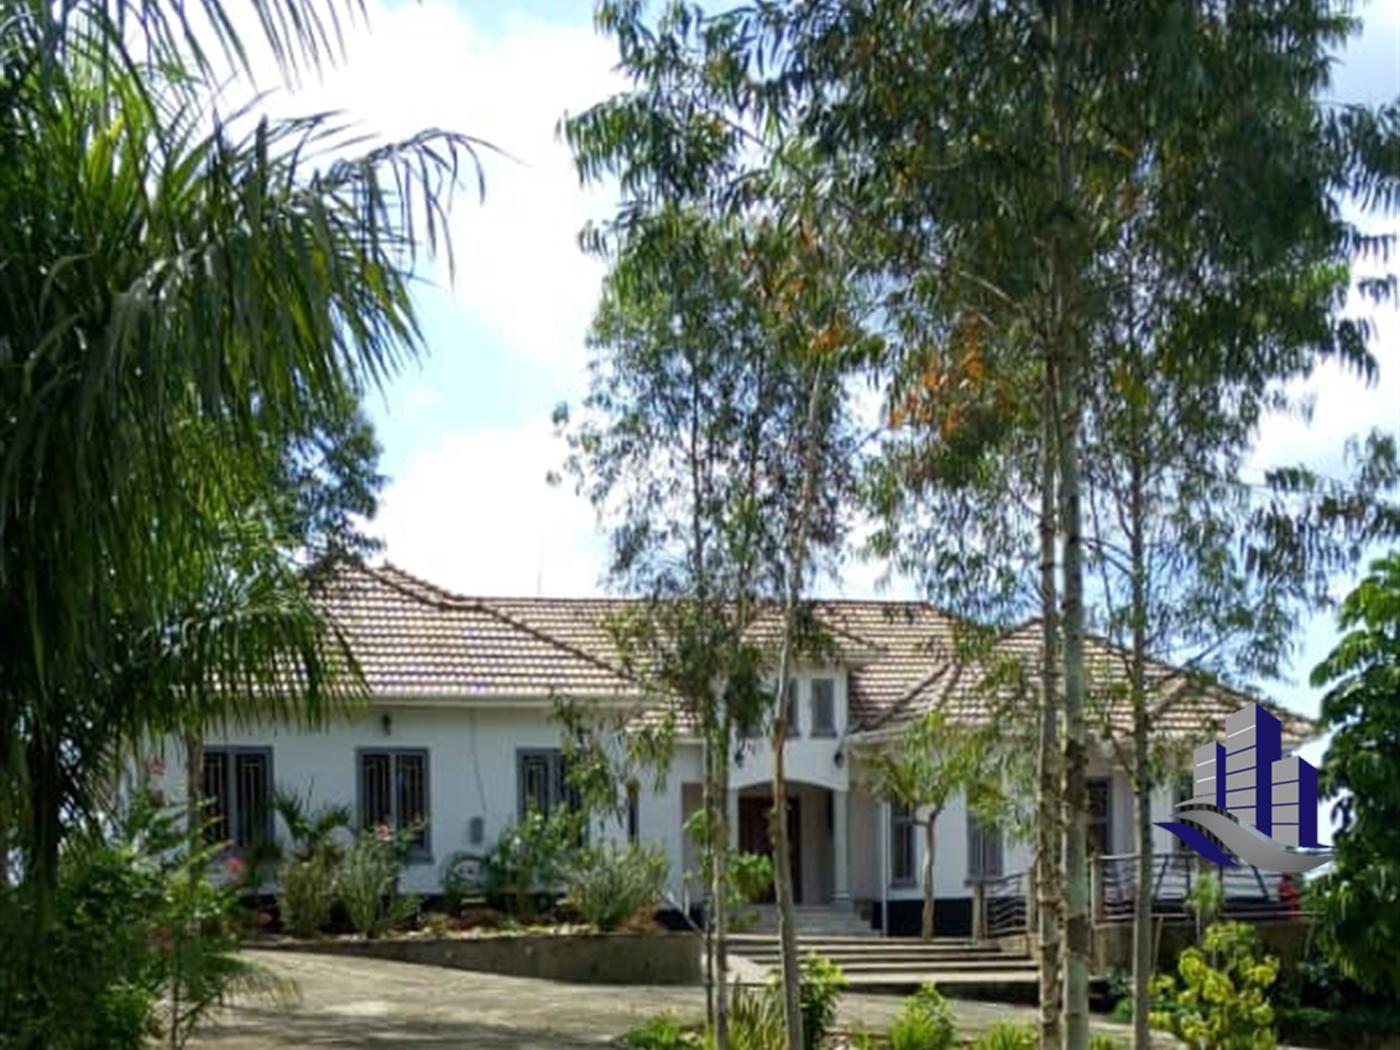 Mansion for sale in Nansana Wakiso